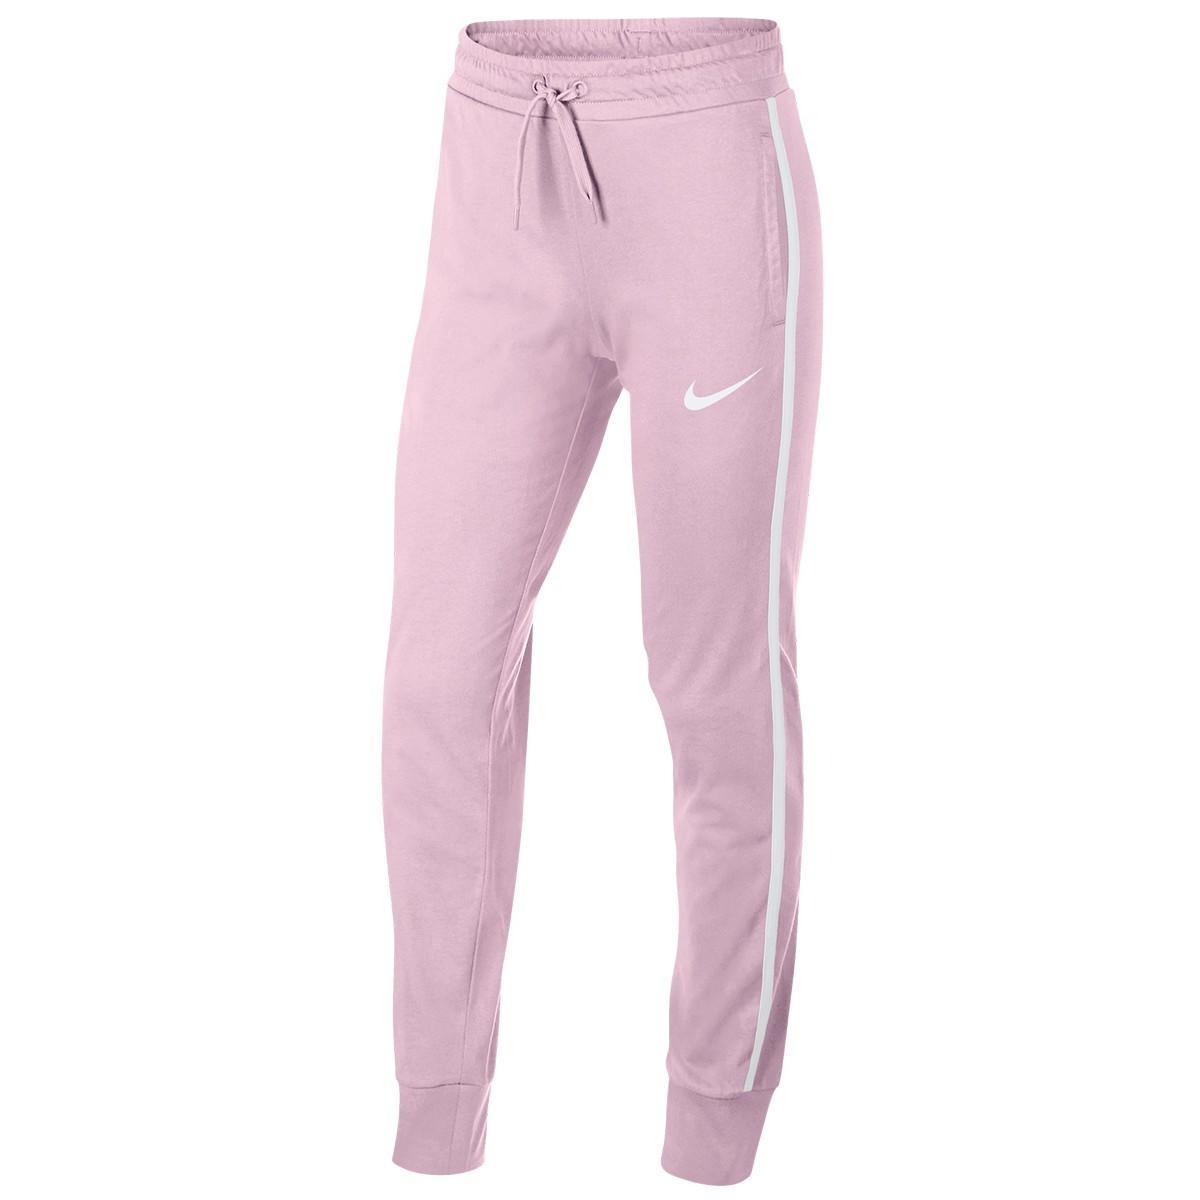 Штаны детские Nike Sportswear Girl's Pants pink/white